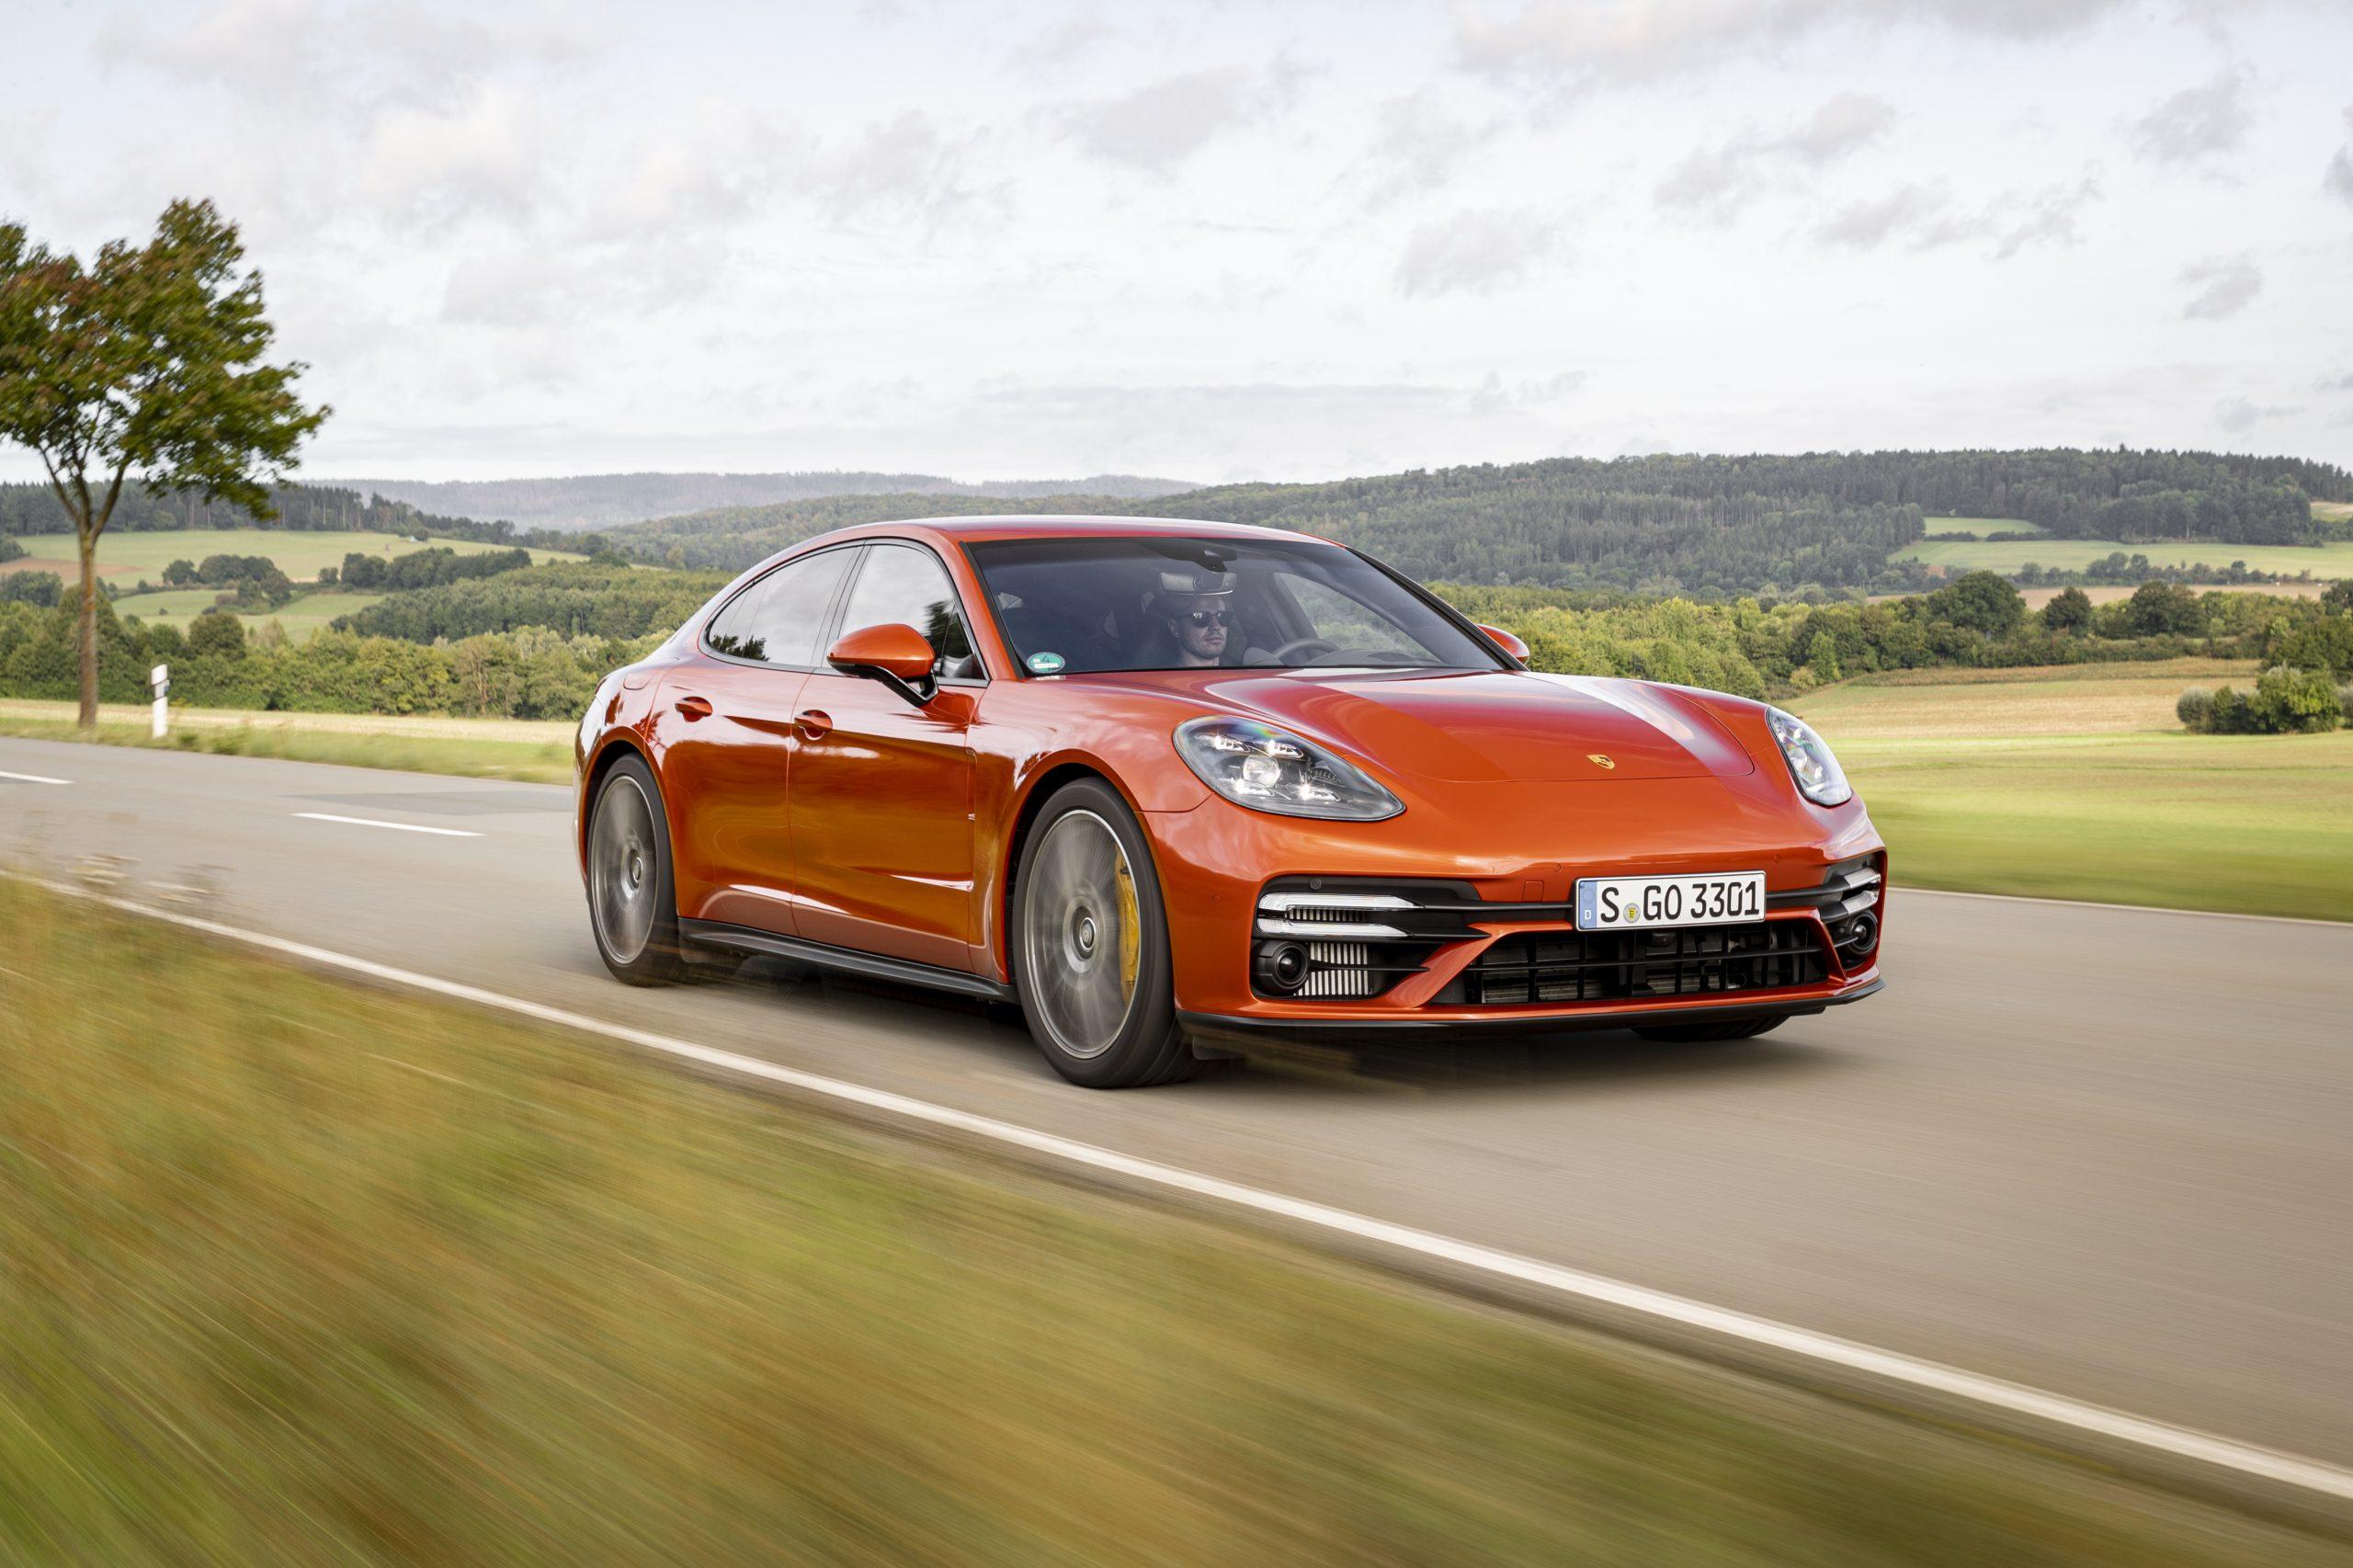 Fastest Four-Door Cars - 2021 Porsche Panamera Turbo S